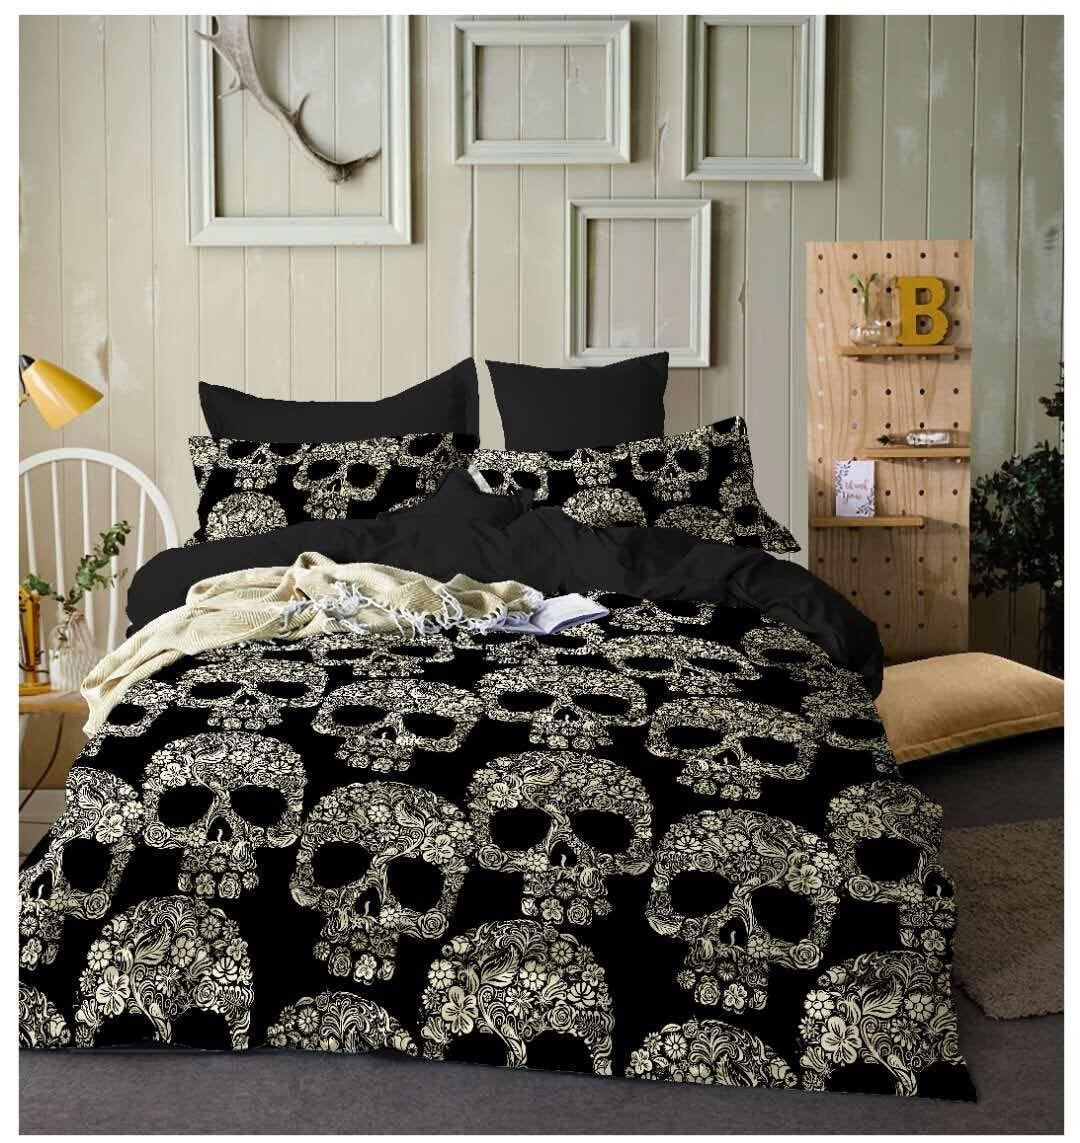 Fashion Design 3d Human Skeleton Head Four Paper Polyester Bedding Set Article Suite Three-piece Popular Market In U.